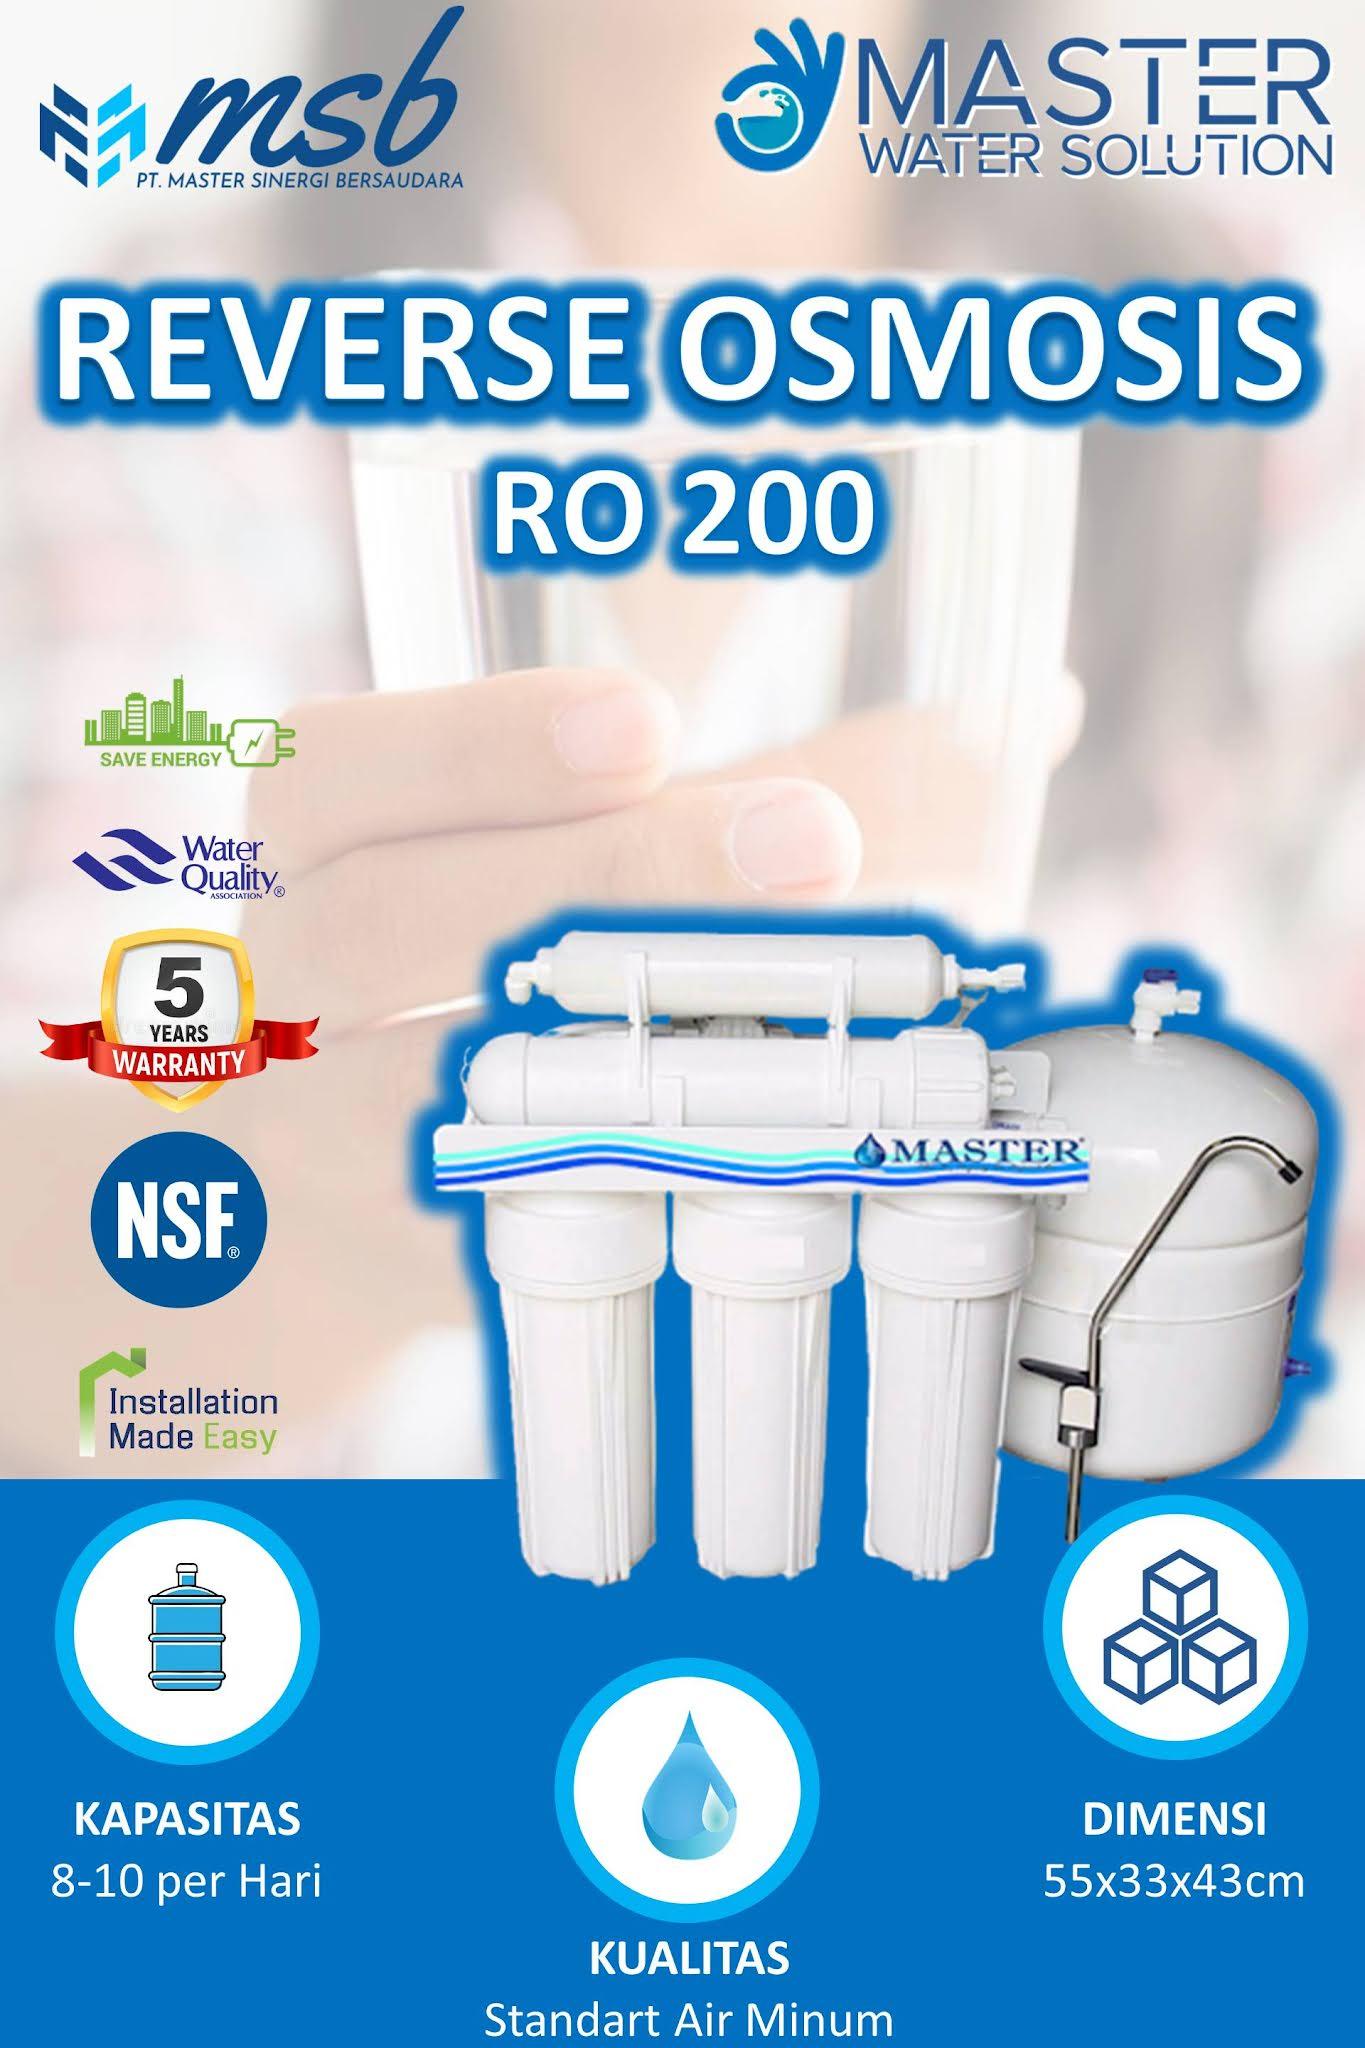 REVERSE OSMOSIS (RO) RUMAH TANGGA